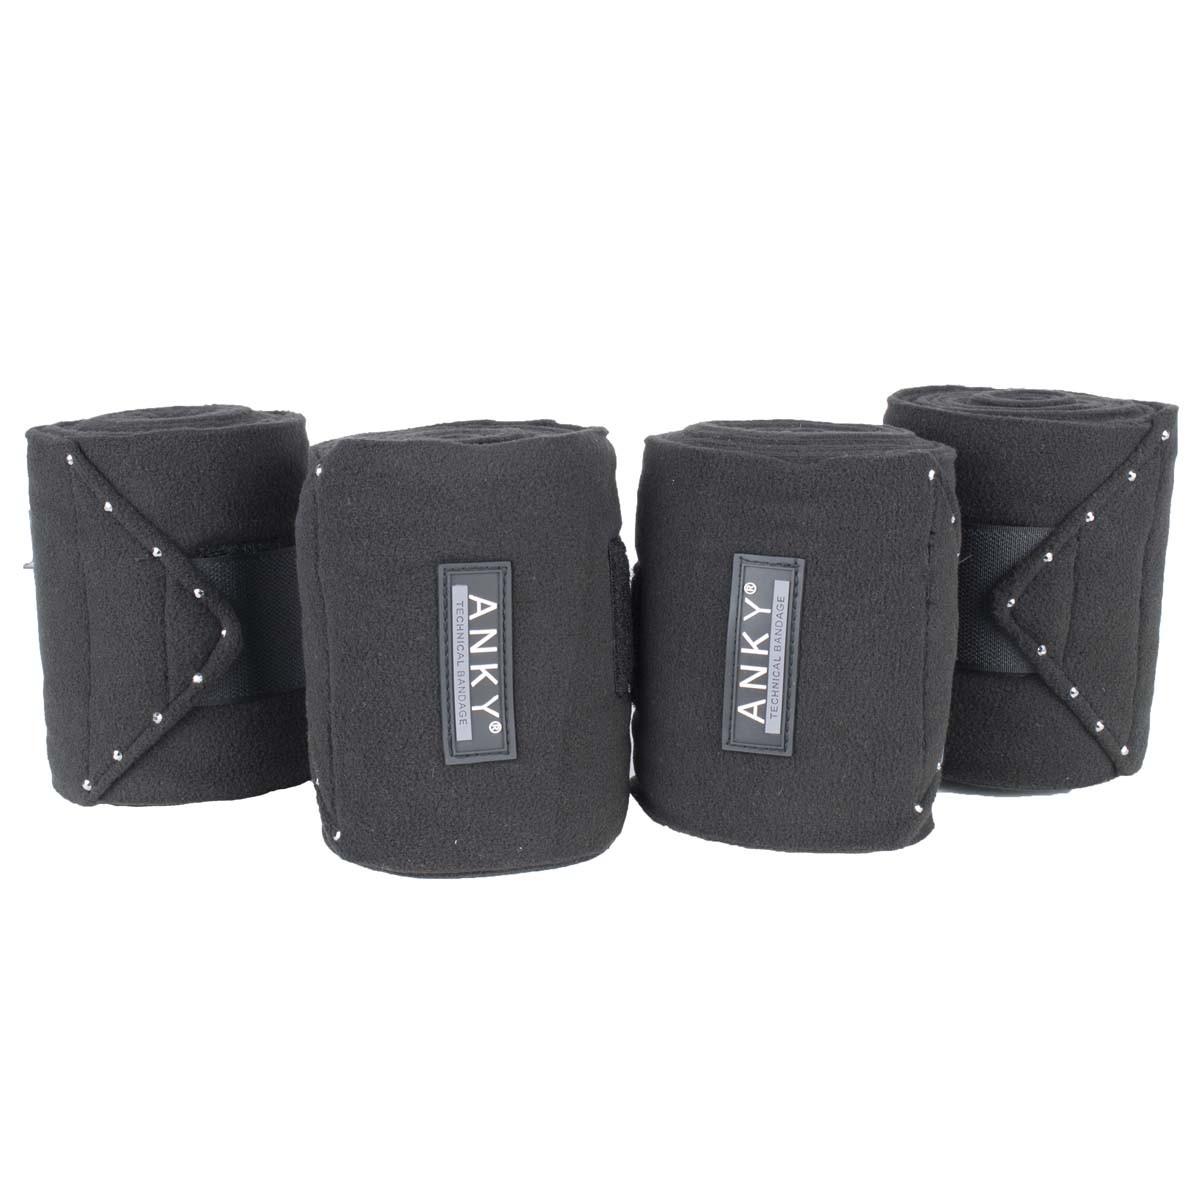 Anky ATB001 Bandages